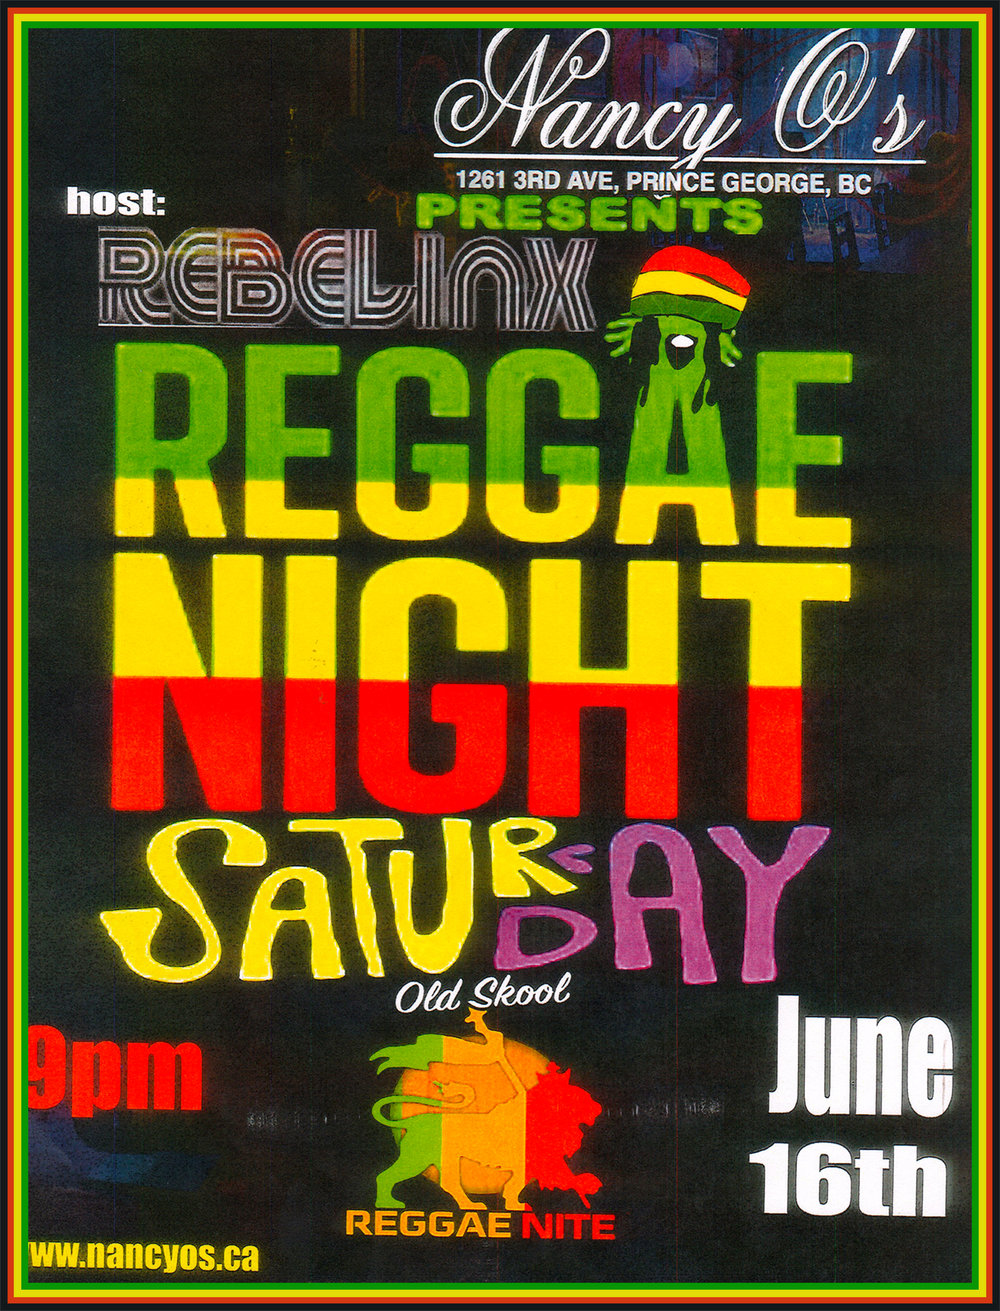 Reggae_night.jpg